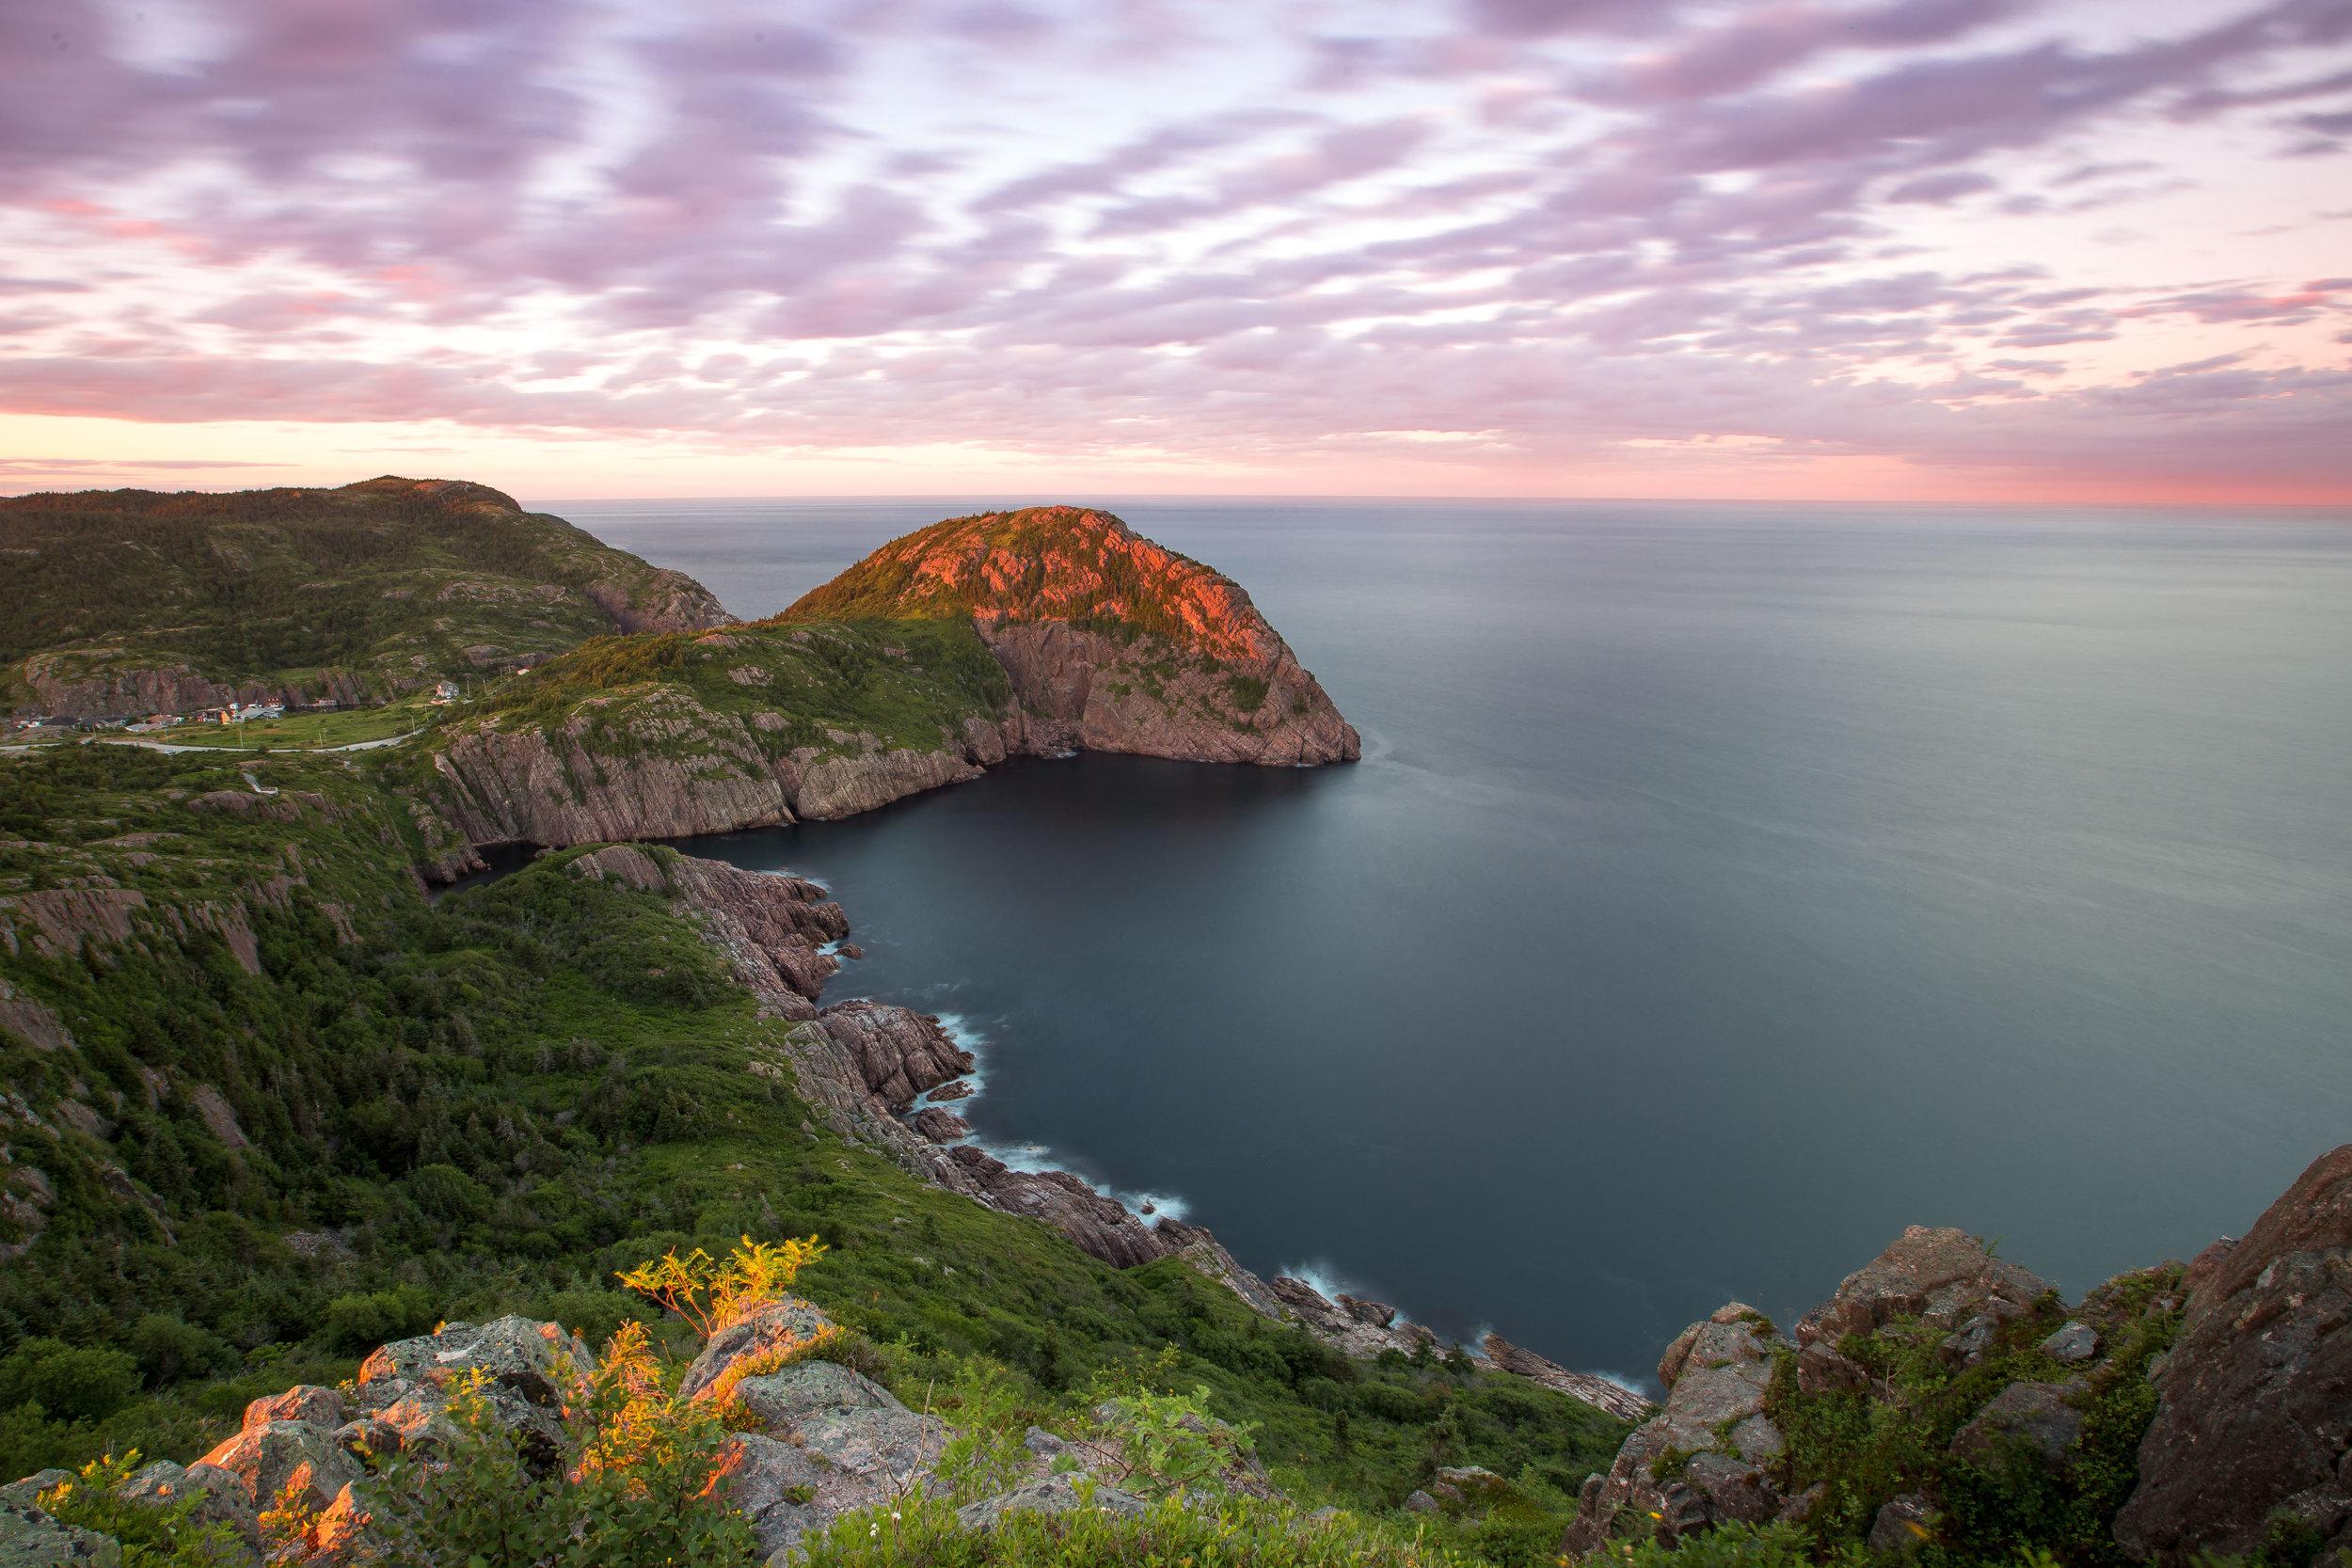 Sunset Cuckold's Cove